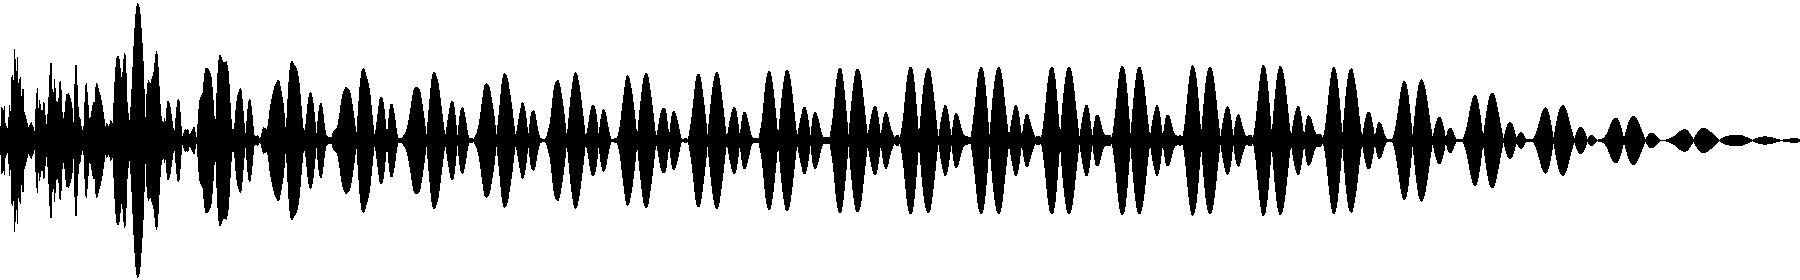 vedh bass cut 040 g